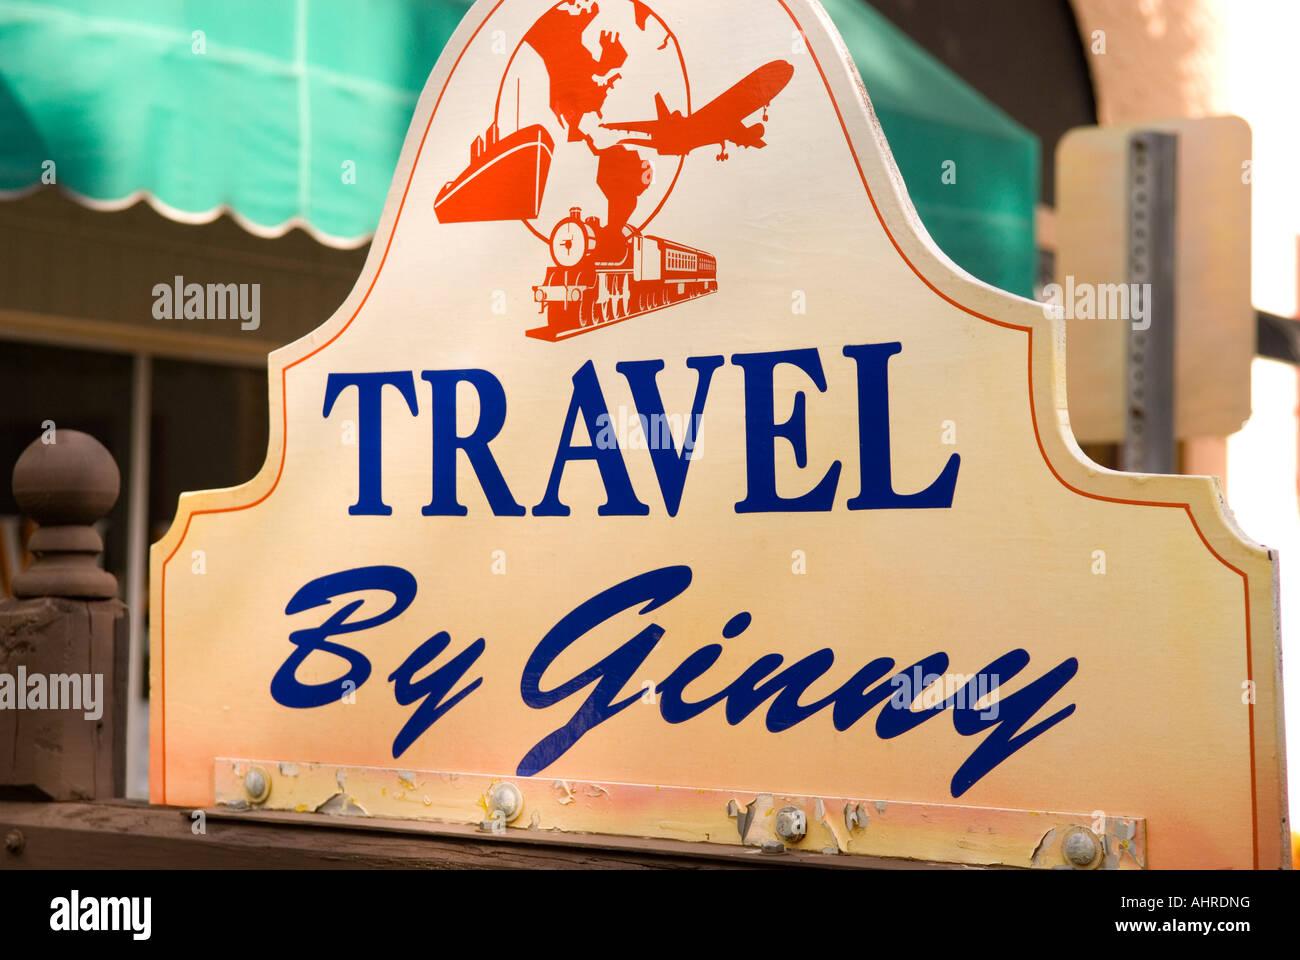 Aaa Travel Agency Melbourne Fl